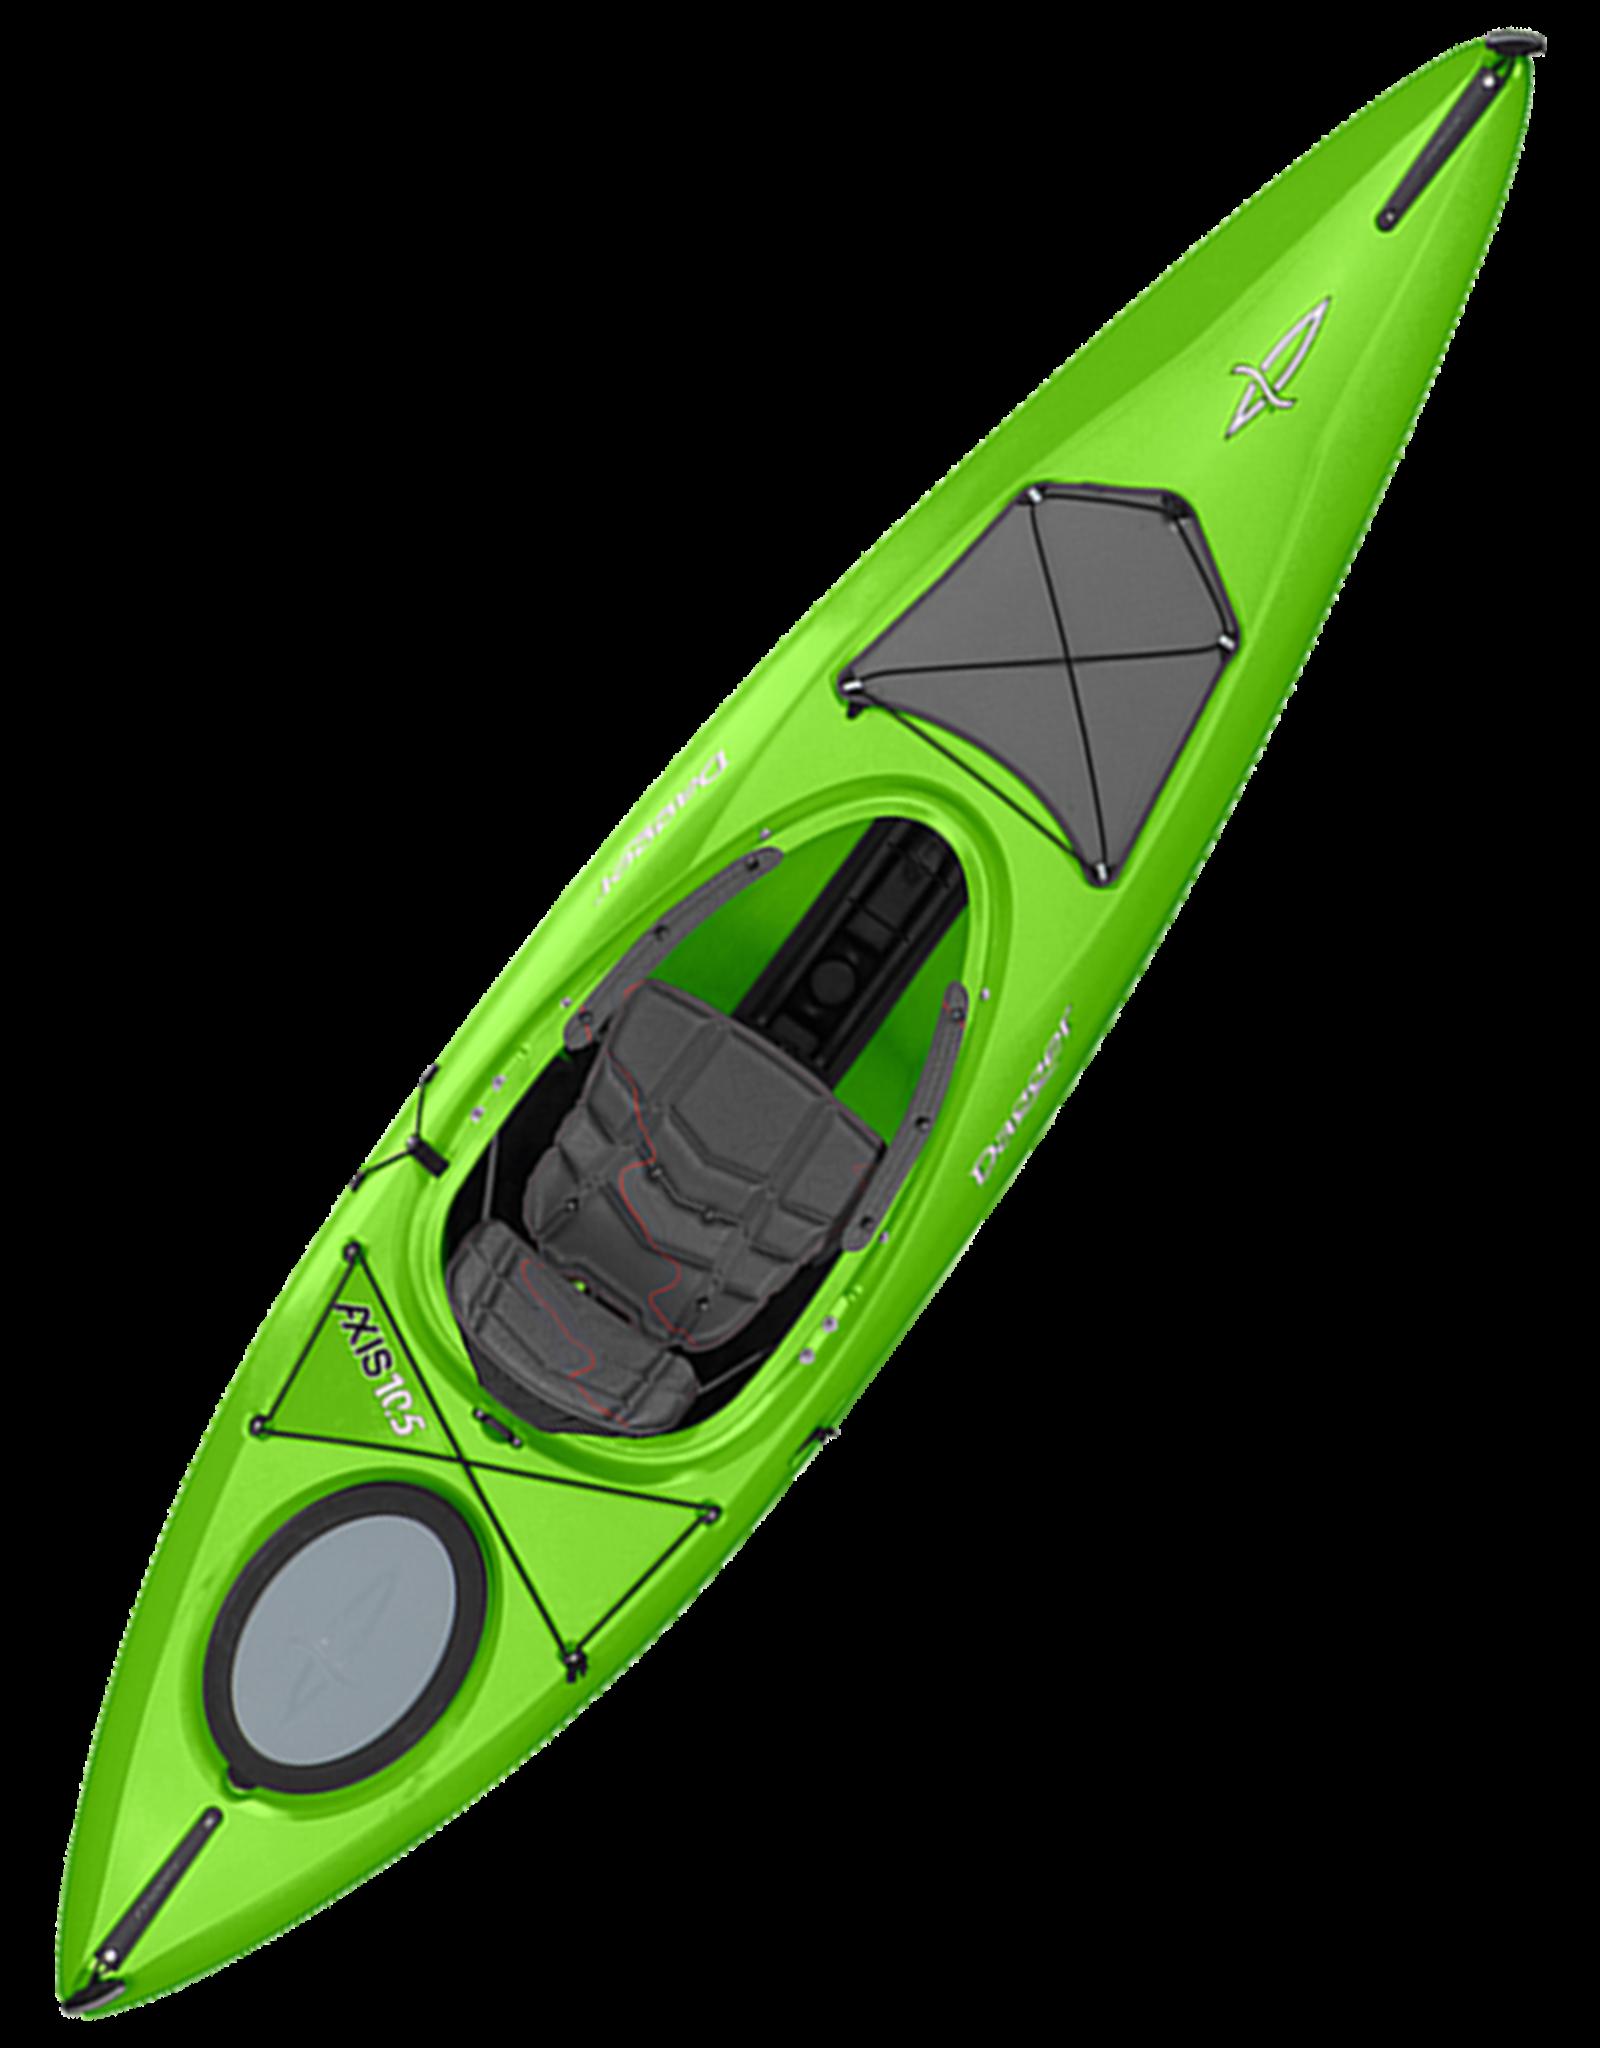 Dagger Kayaks Dagger Axis Flatwater Kayak